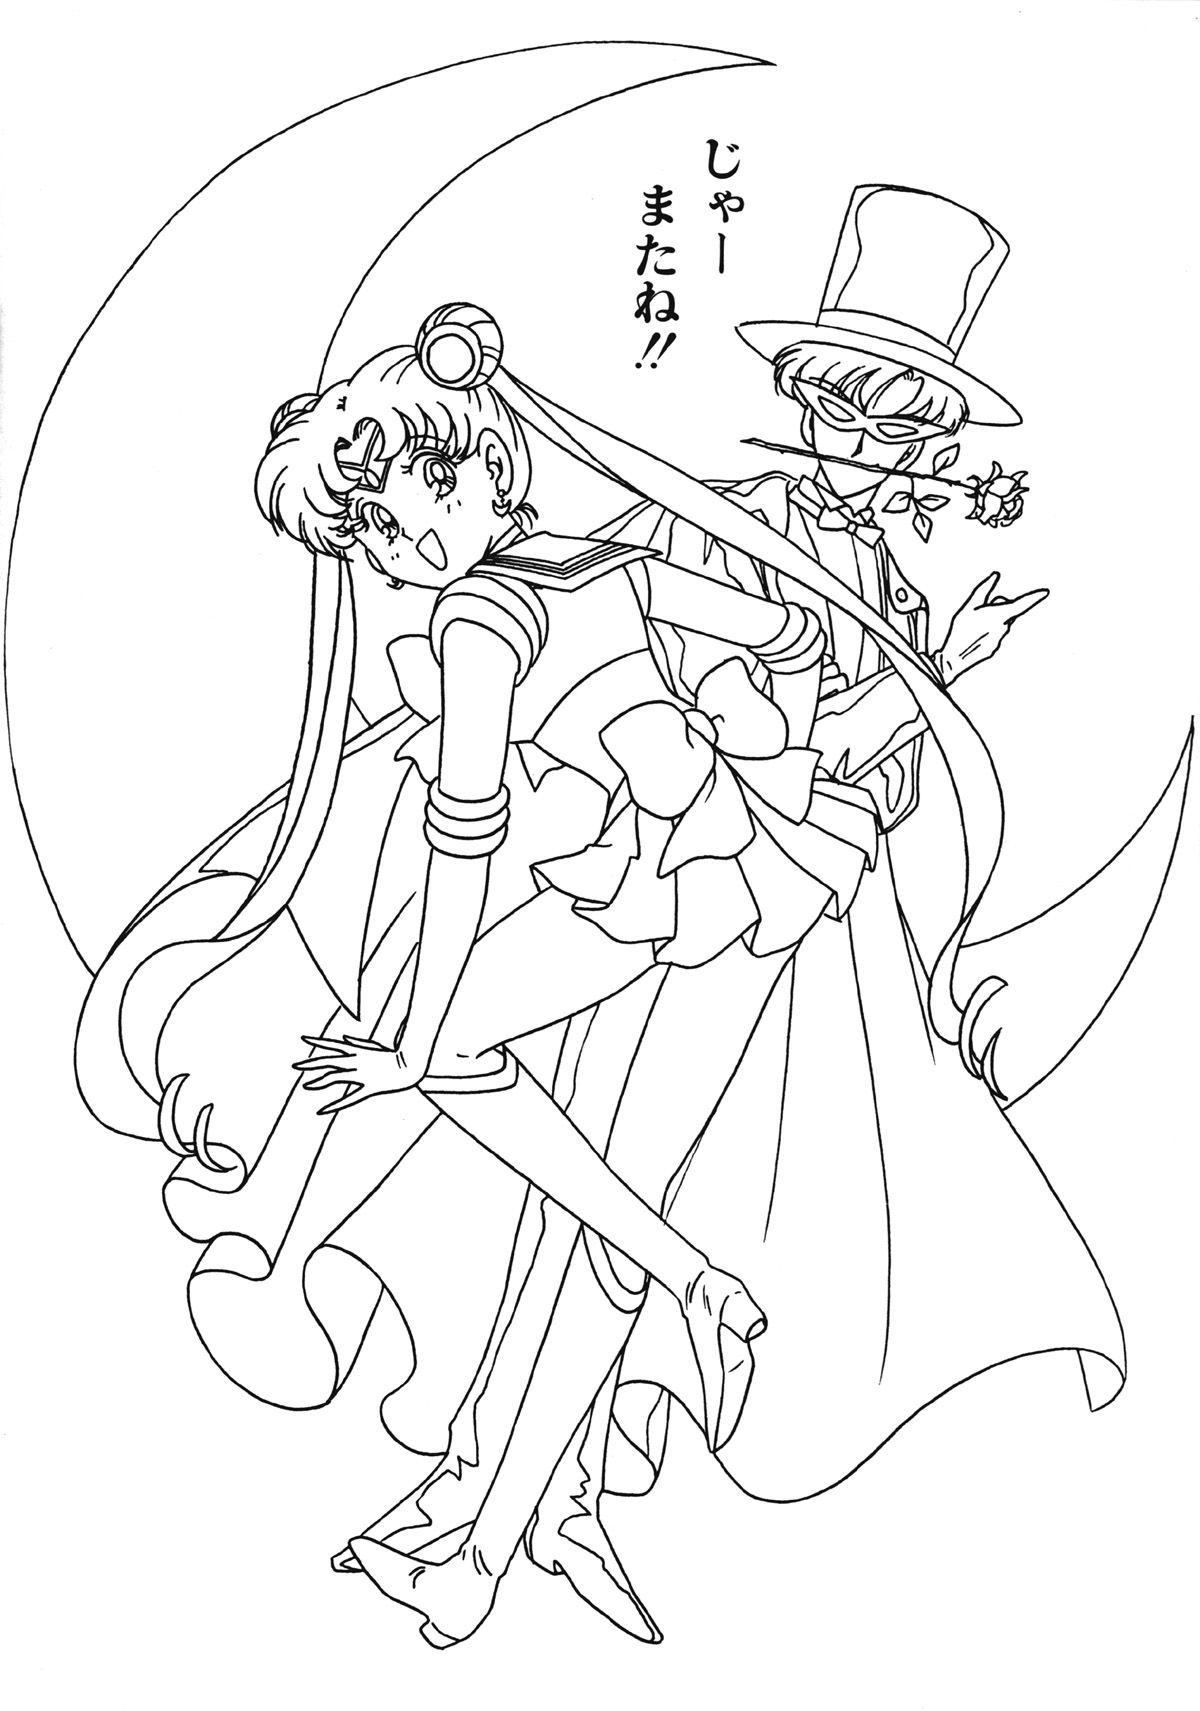 tuxcedo mask coloring pages | Sailor Moon and Tuxedo Kamen Coloring Page // #sailormoon ...